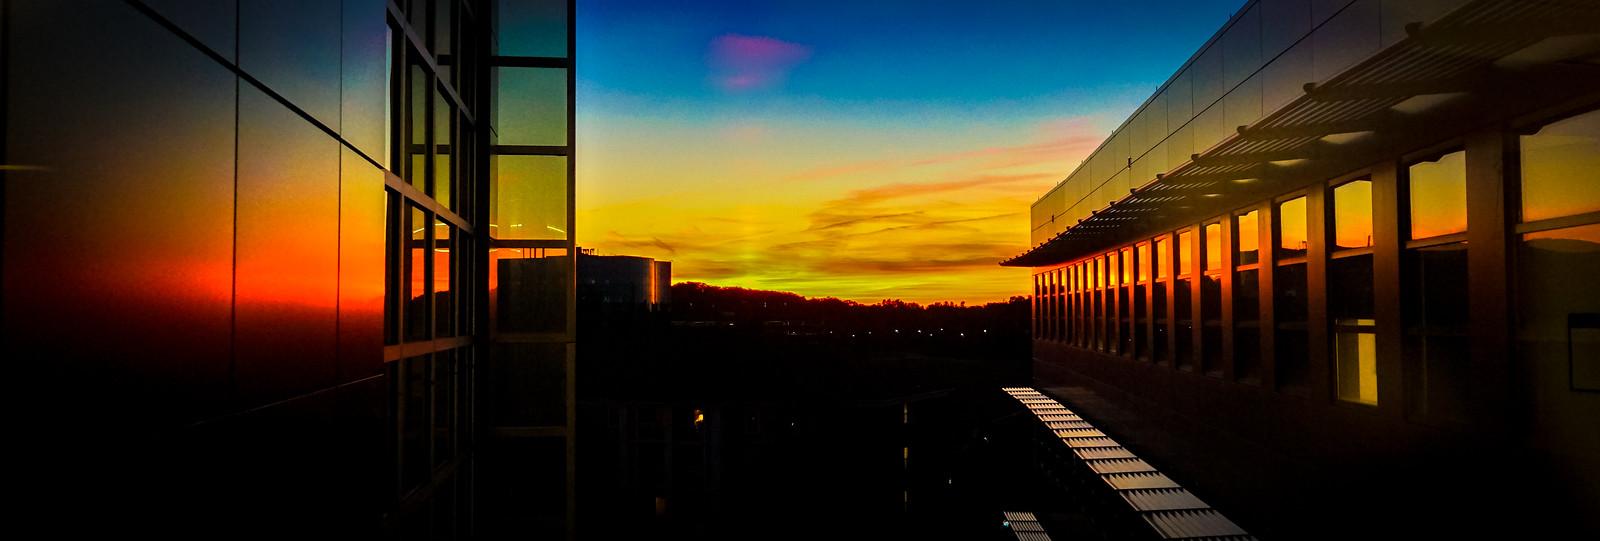 Photo Friday: Sunset at The Universities at Shady Grove, Maryland, USA